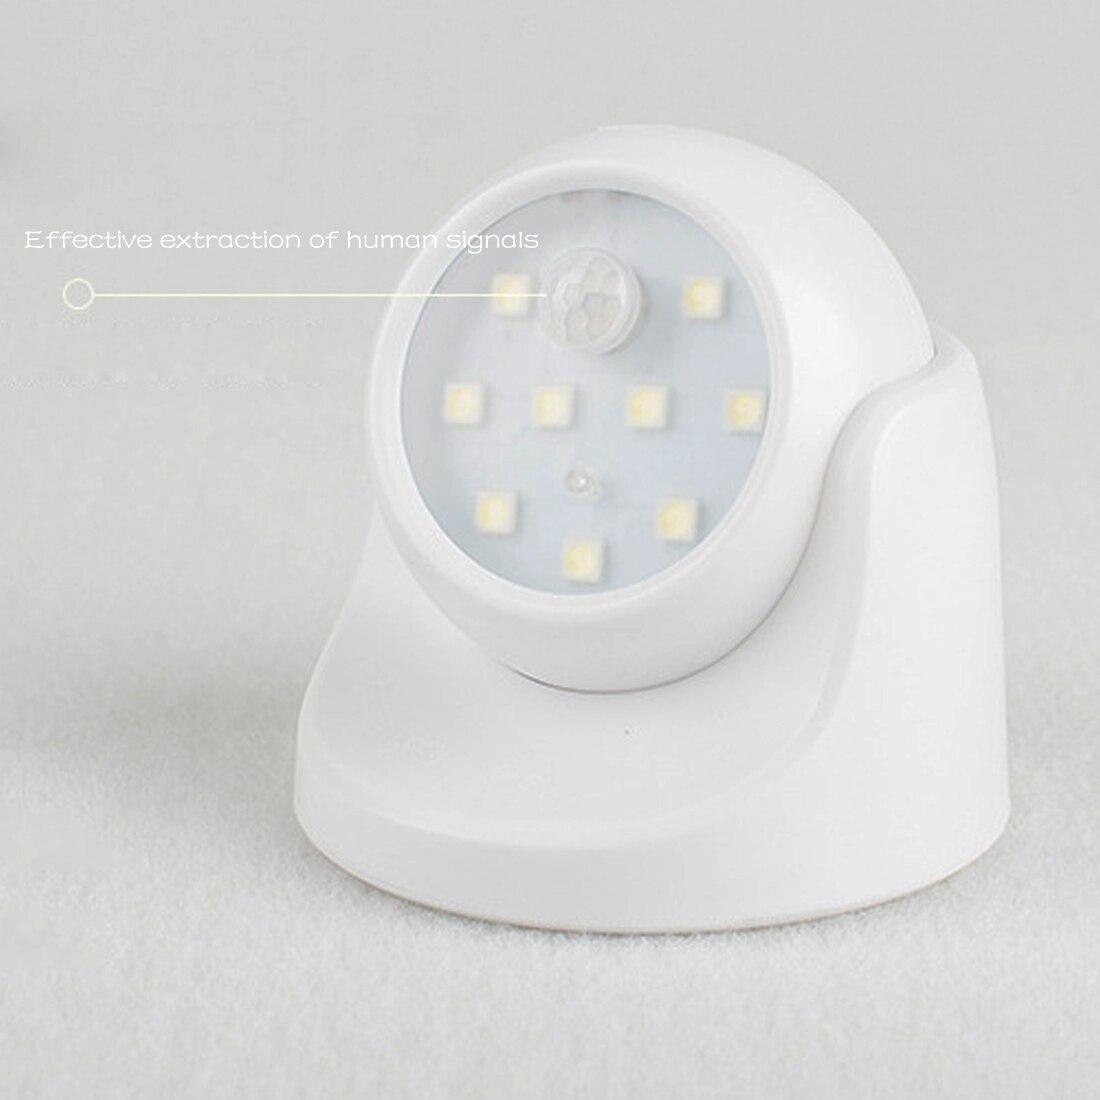 Newest 9 LED Motion Sensor Night Light 360 Degree Rotation Portable Night Light Auto IR Infrared Luminary Lamp Children Lamp LED sn101 mini 360 degree rotation 0 1w yellow light auto sensor night lamp white 2 round pin plug